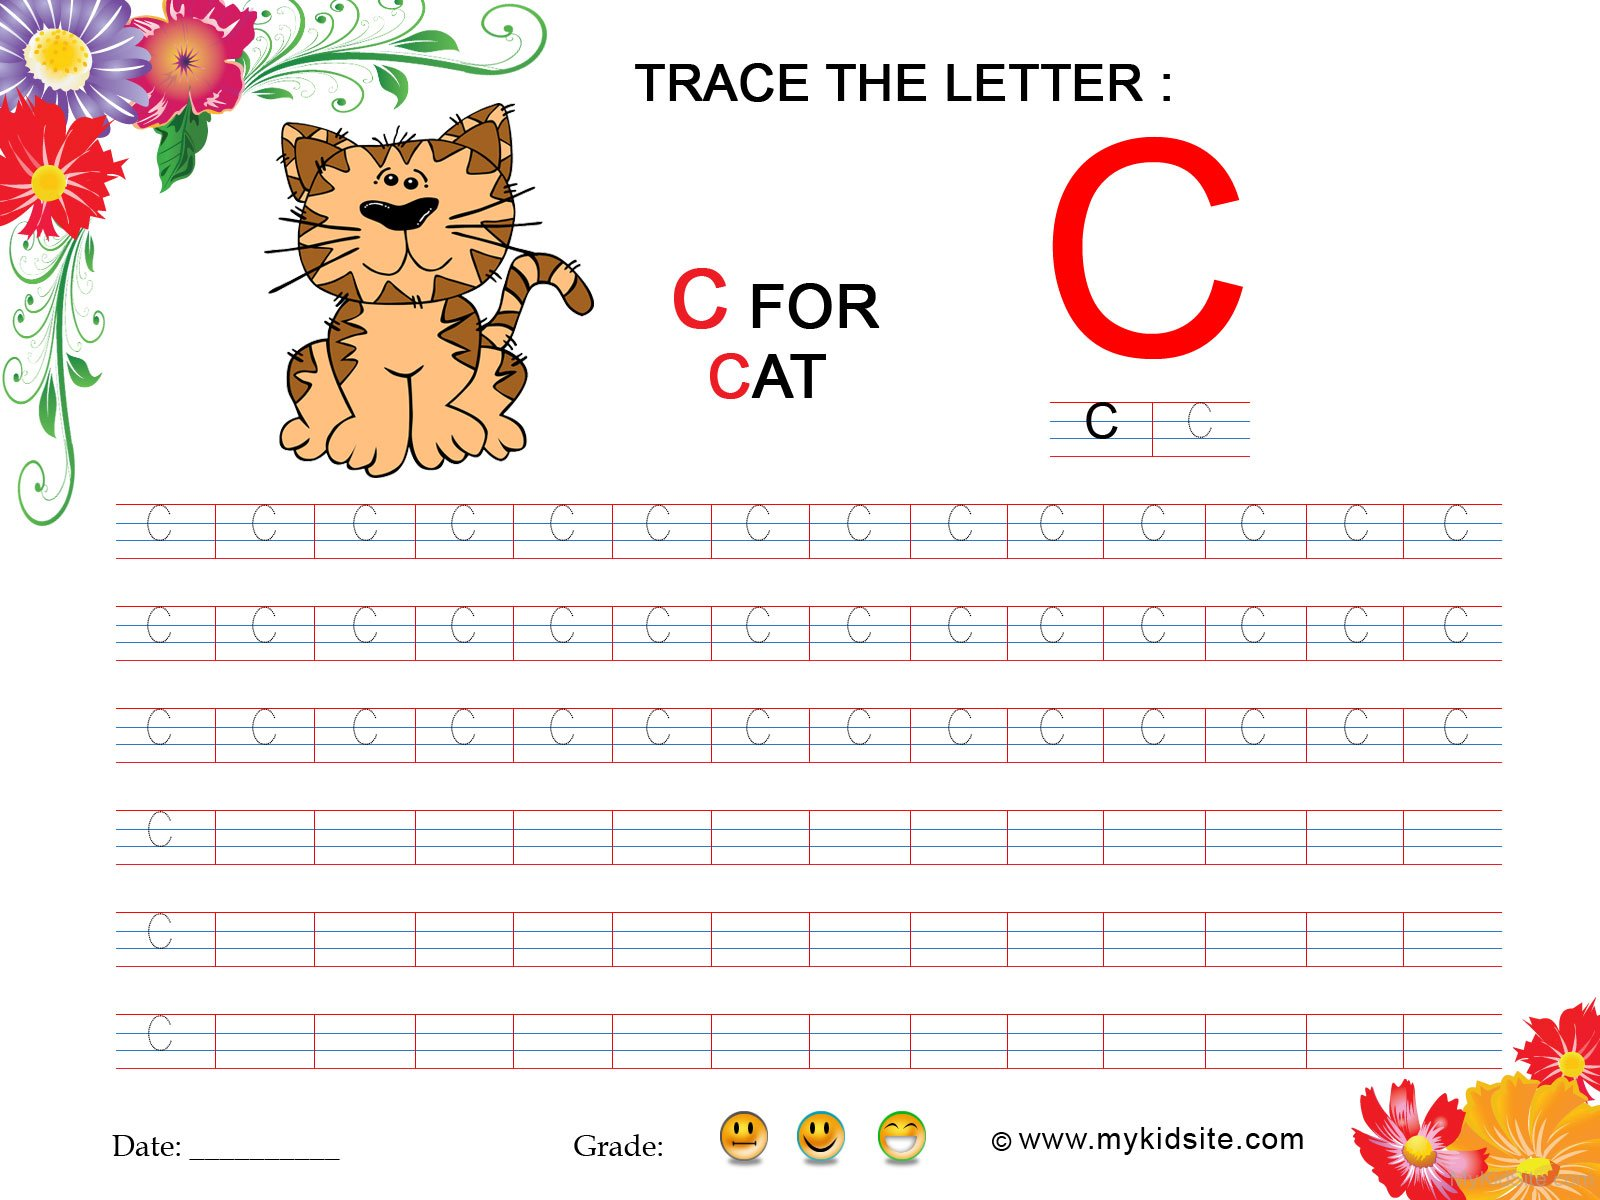 Tracing Worksheet For Letter C